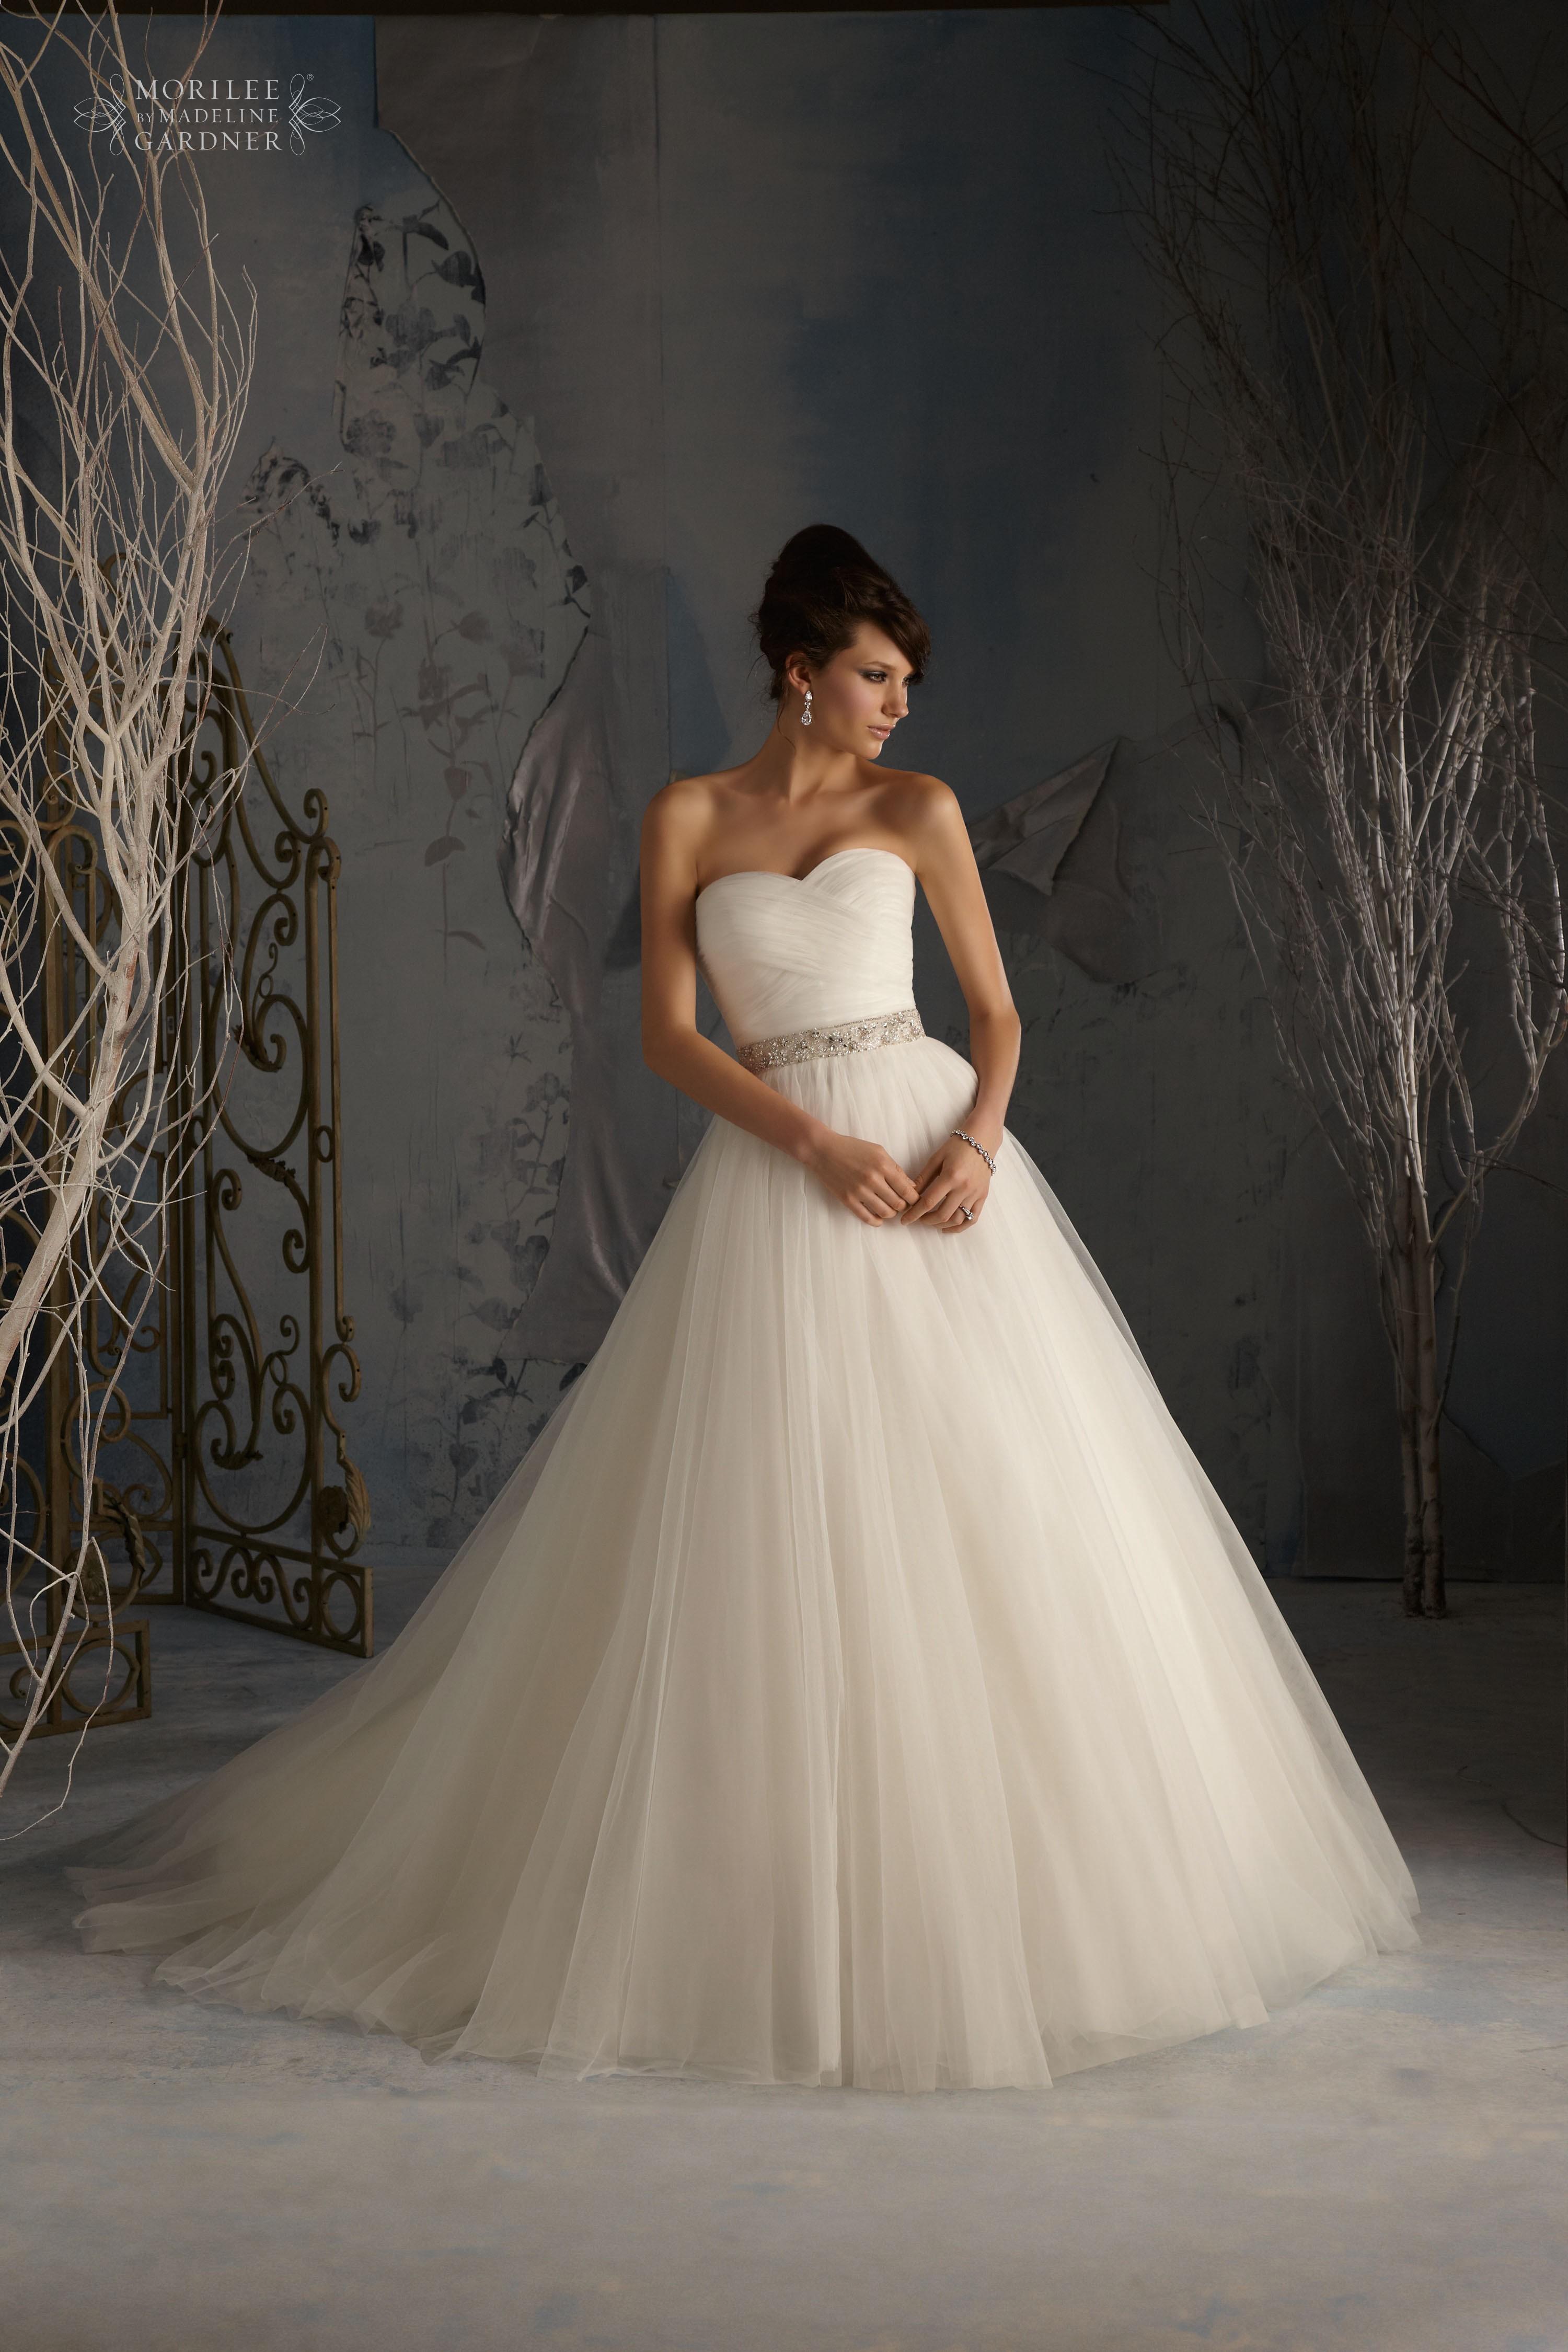 Mori lee 5172 wedding dress